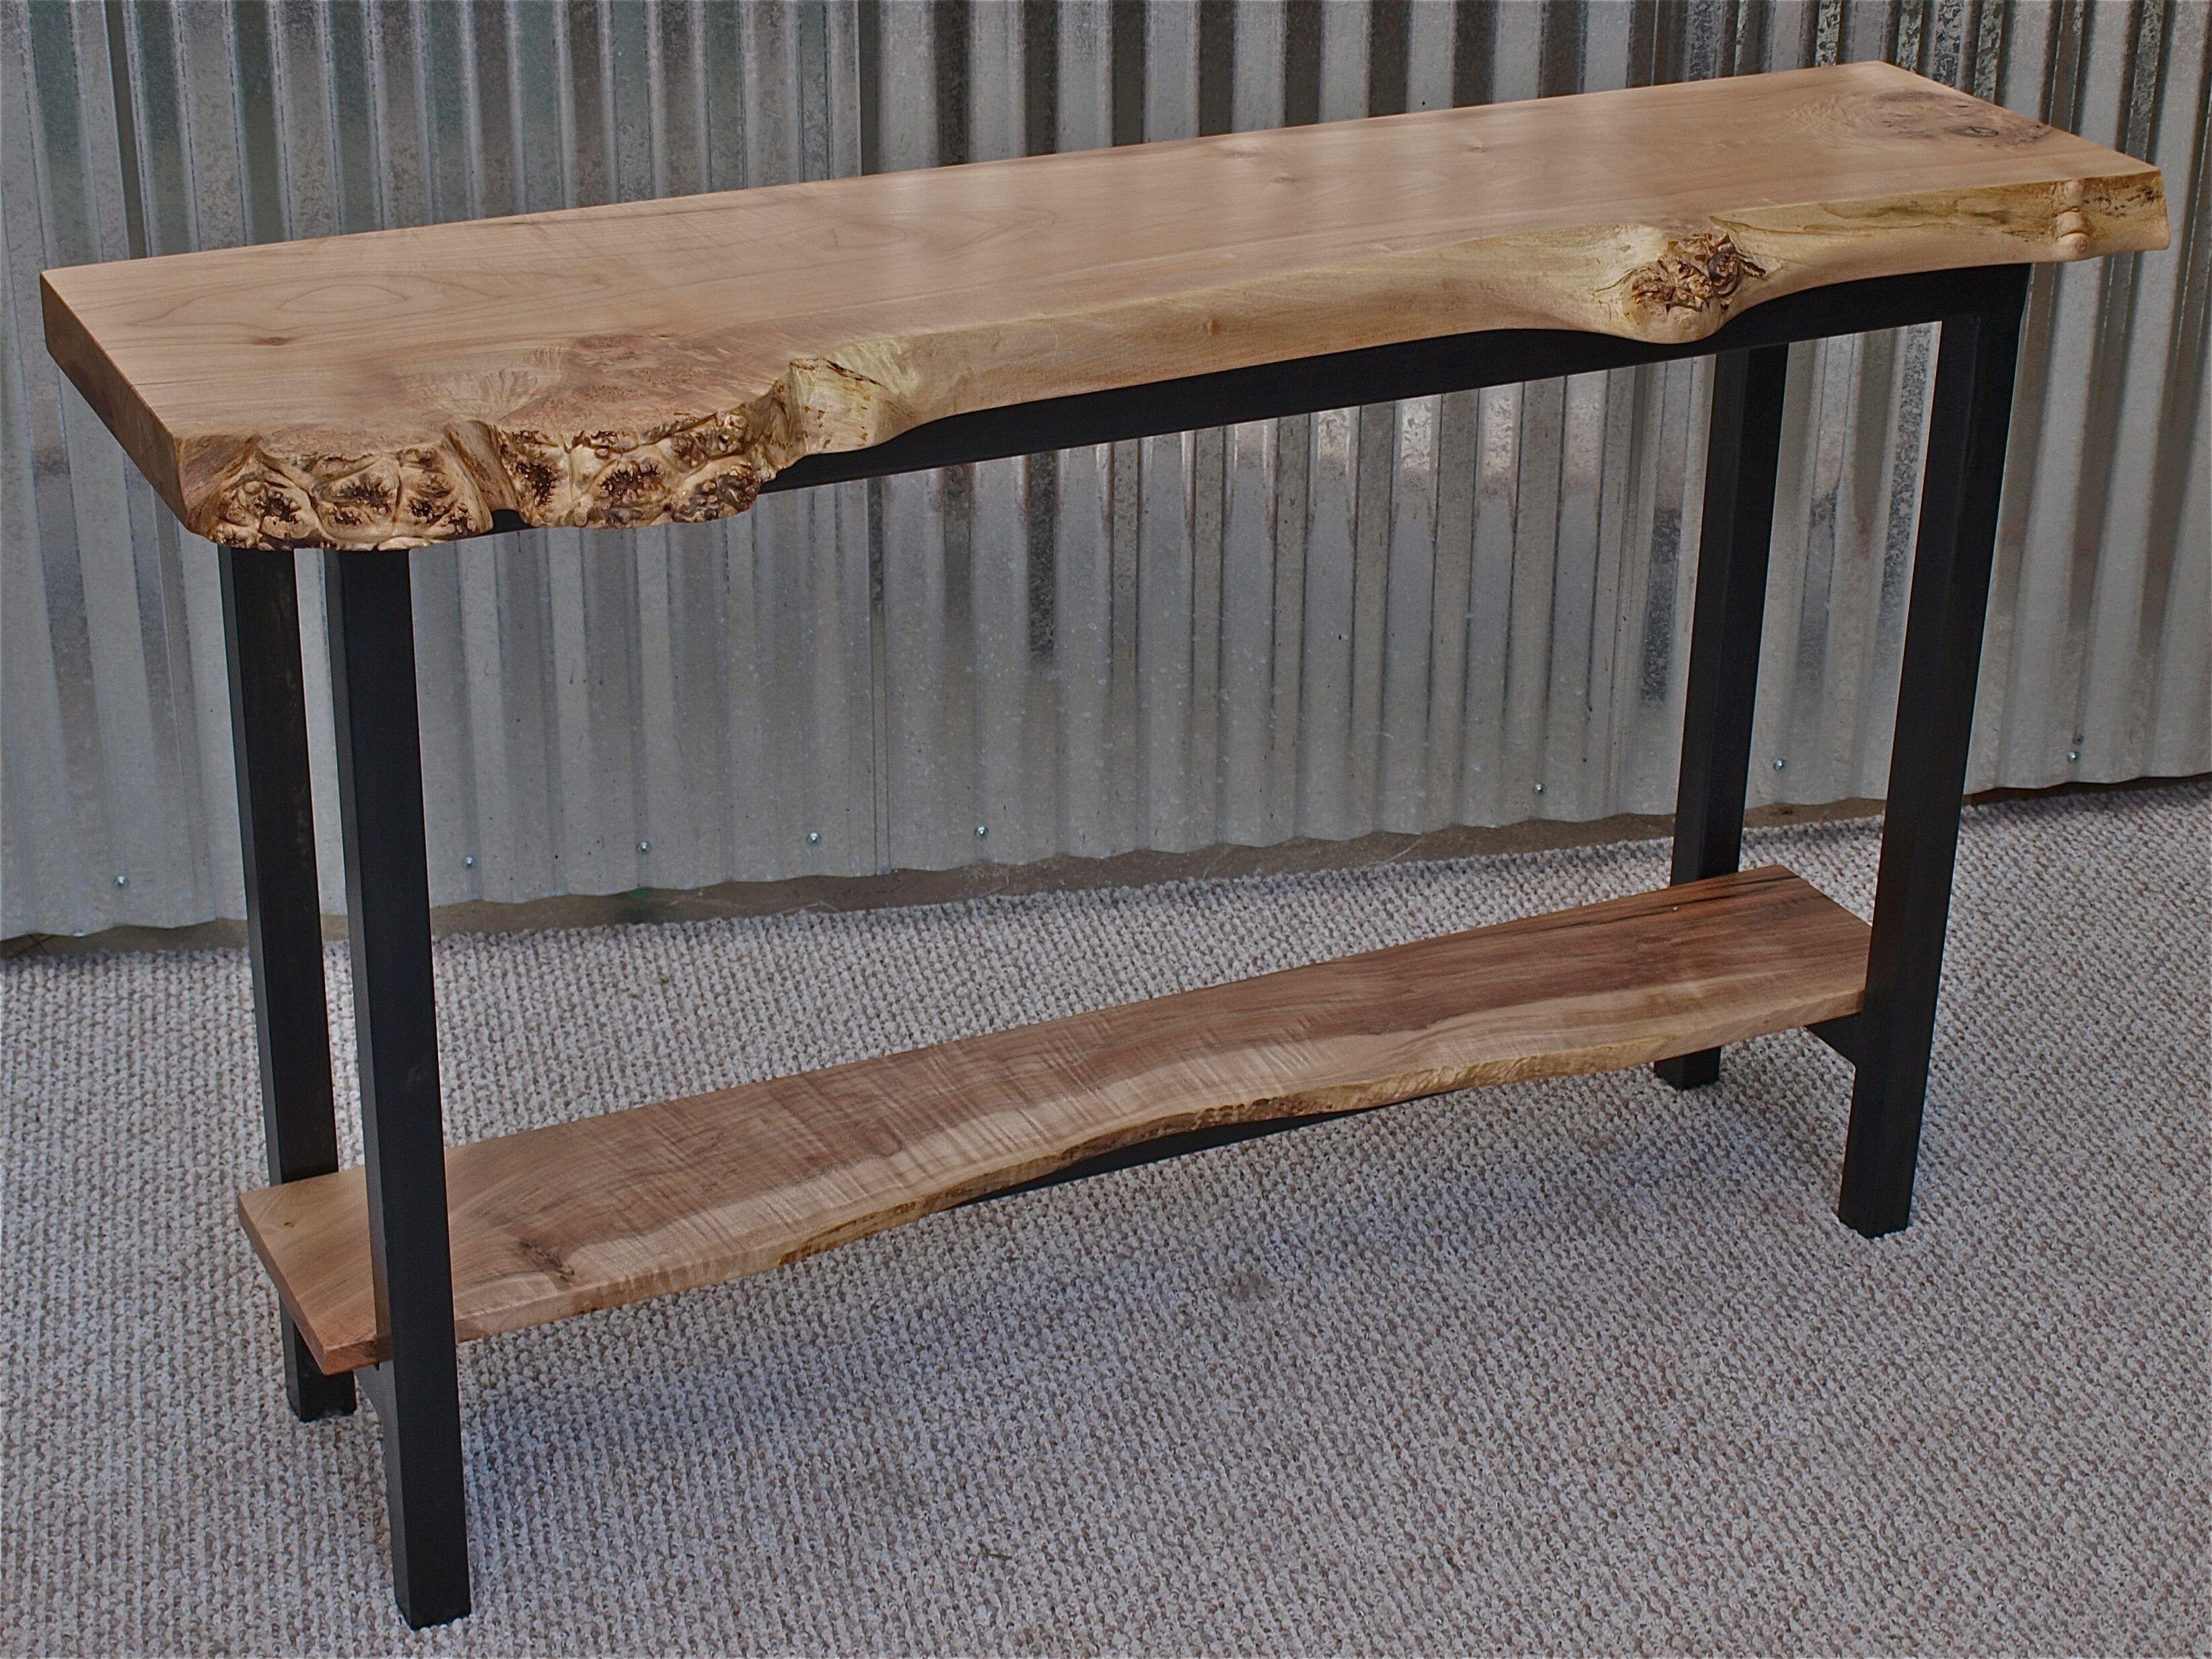 Surprising Live Edge Maple Console Table Blackened Steel Base 48 X Ibusinesslaw Wood Chair Design Ideas Ibusinesslaworg